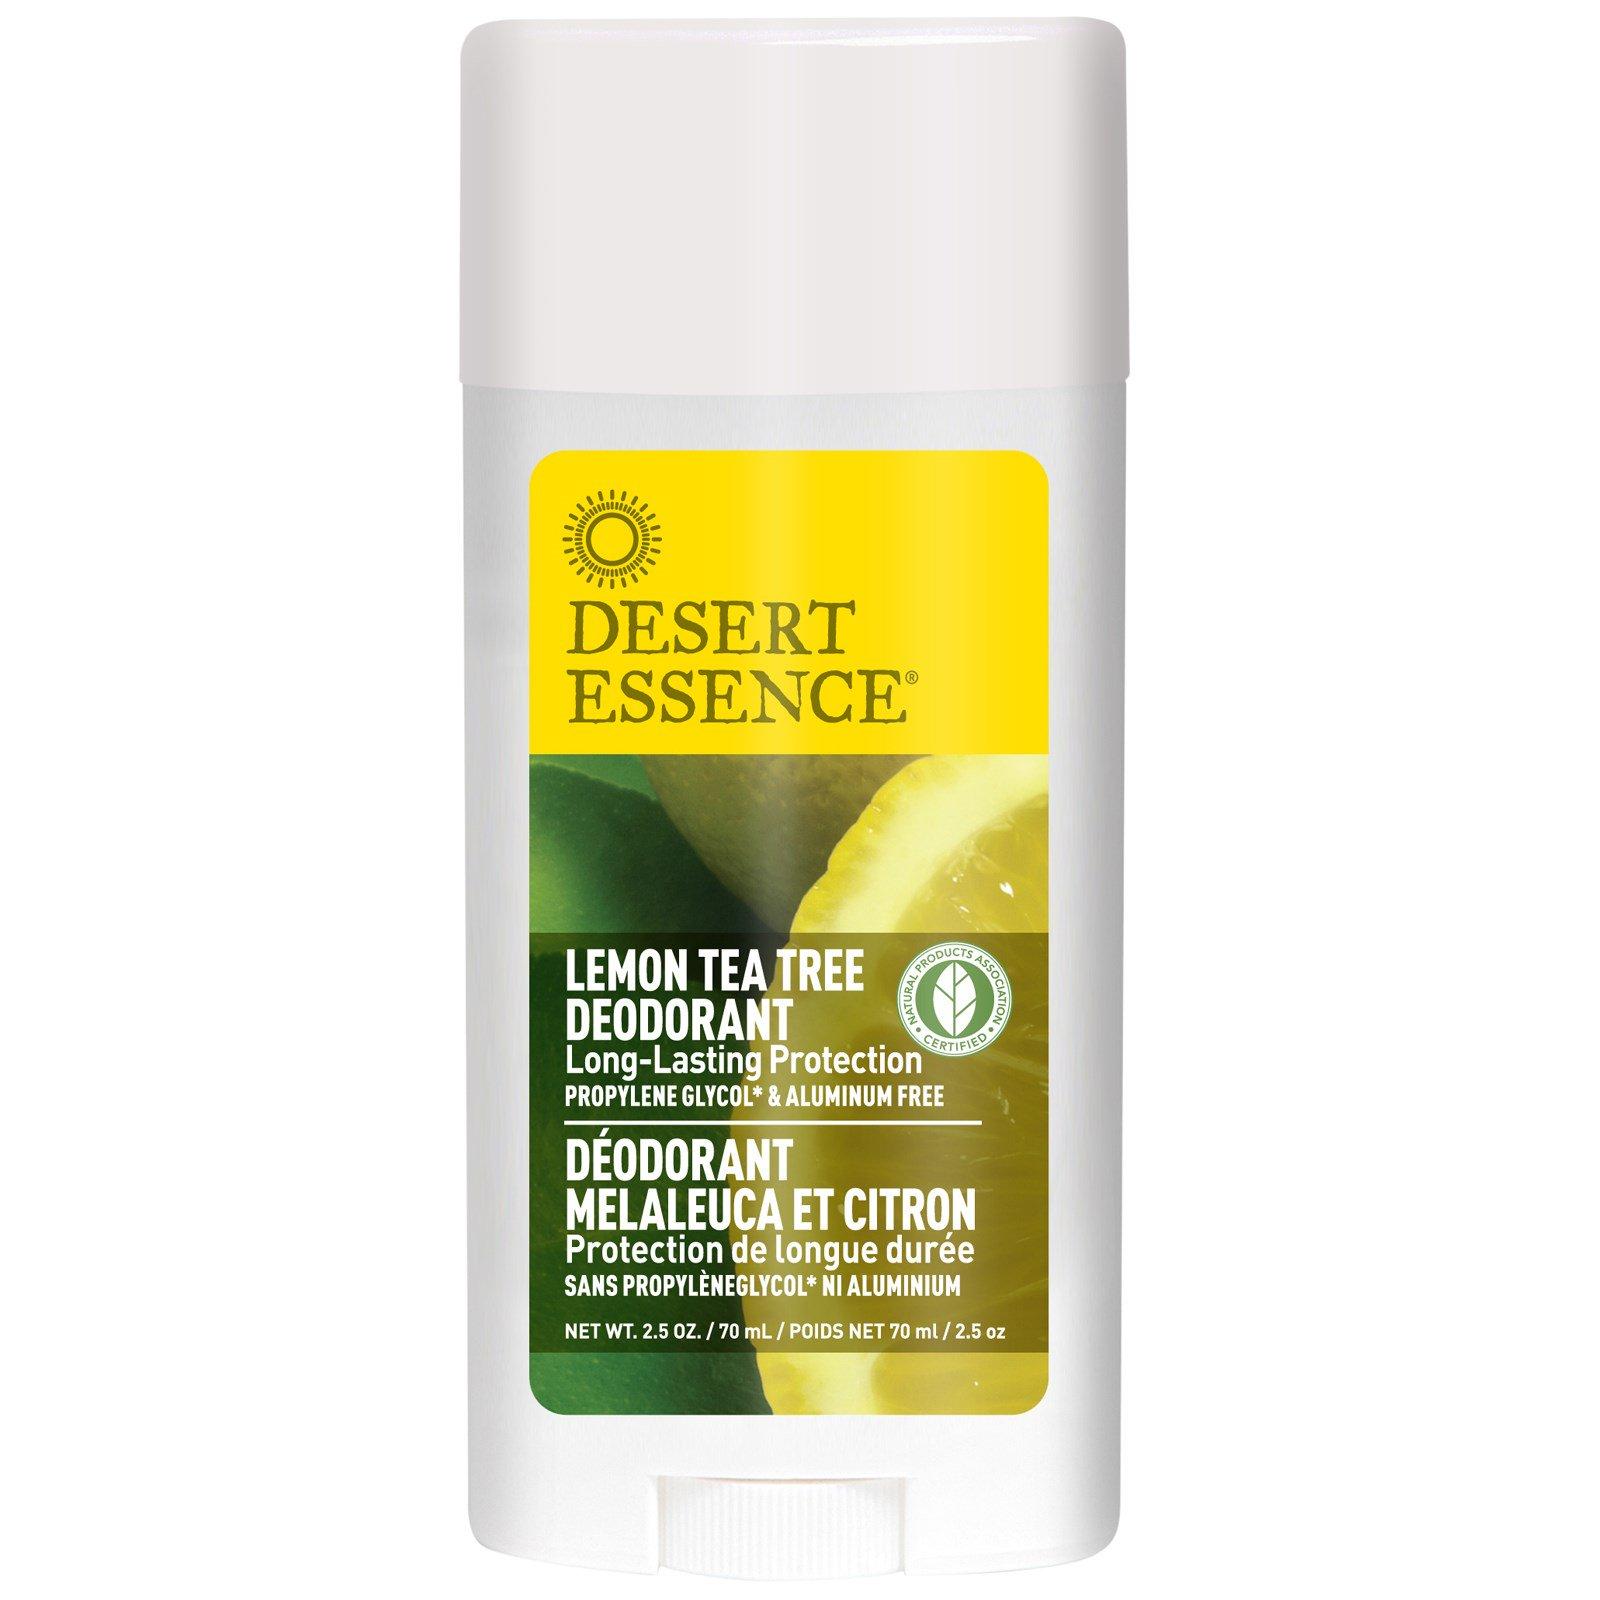 Desert Essence, Дезодорант, лимон чайное дерево, 2,5 унции (70 мл)